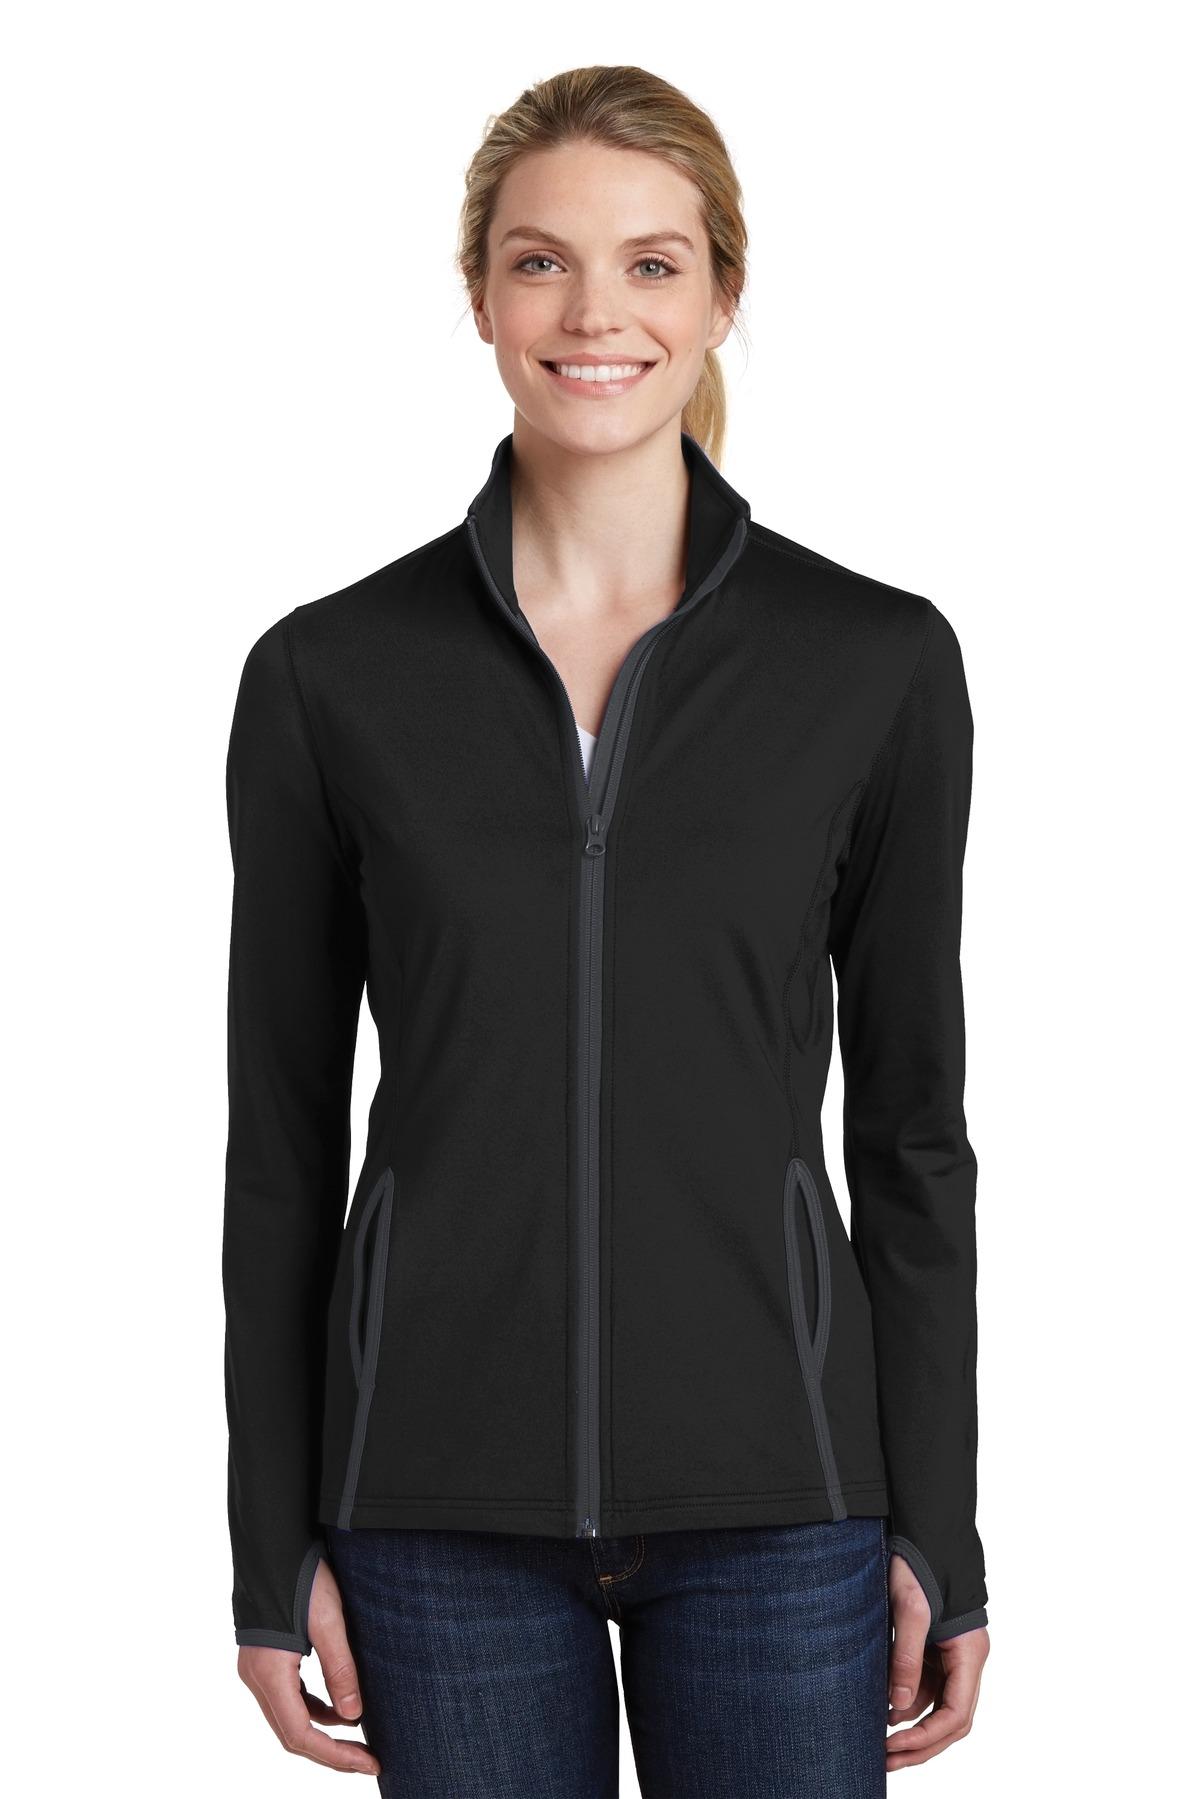 Sport-Tek  Ladies Sport-Wick  LST853 - Stretch Contrast Full-Zip Jacket